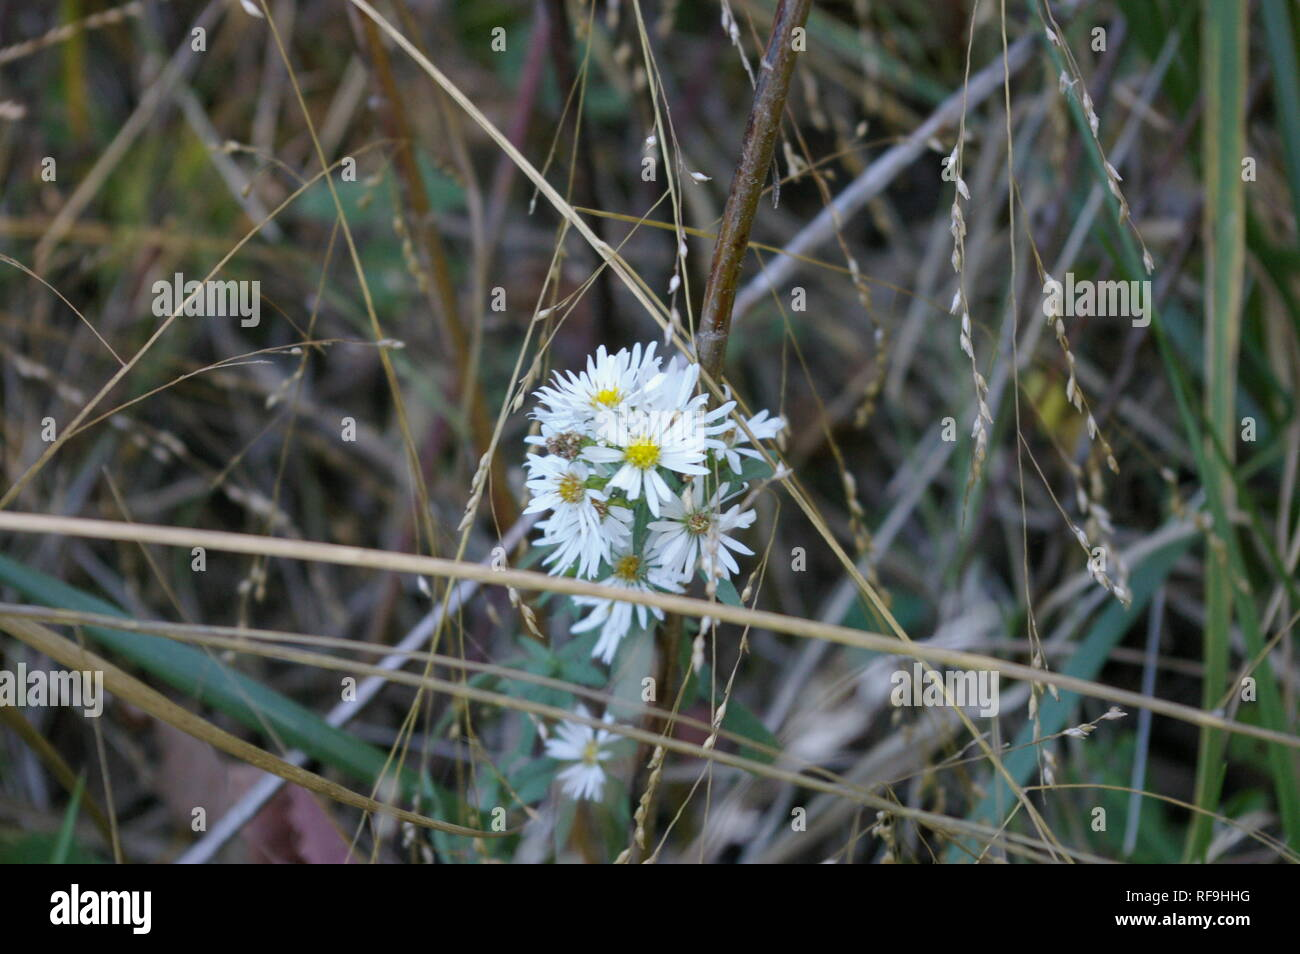 Small white prairie flower (Aster family) - Stock Image